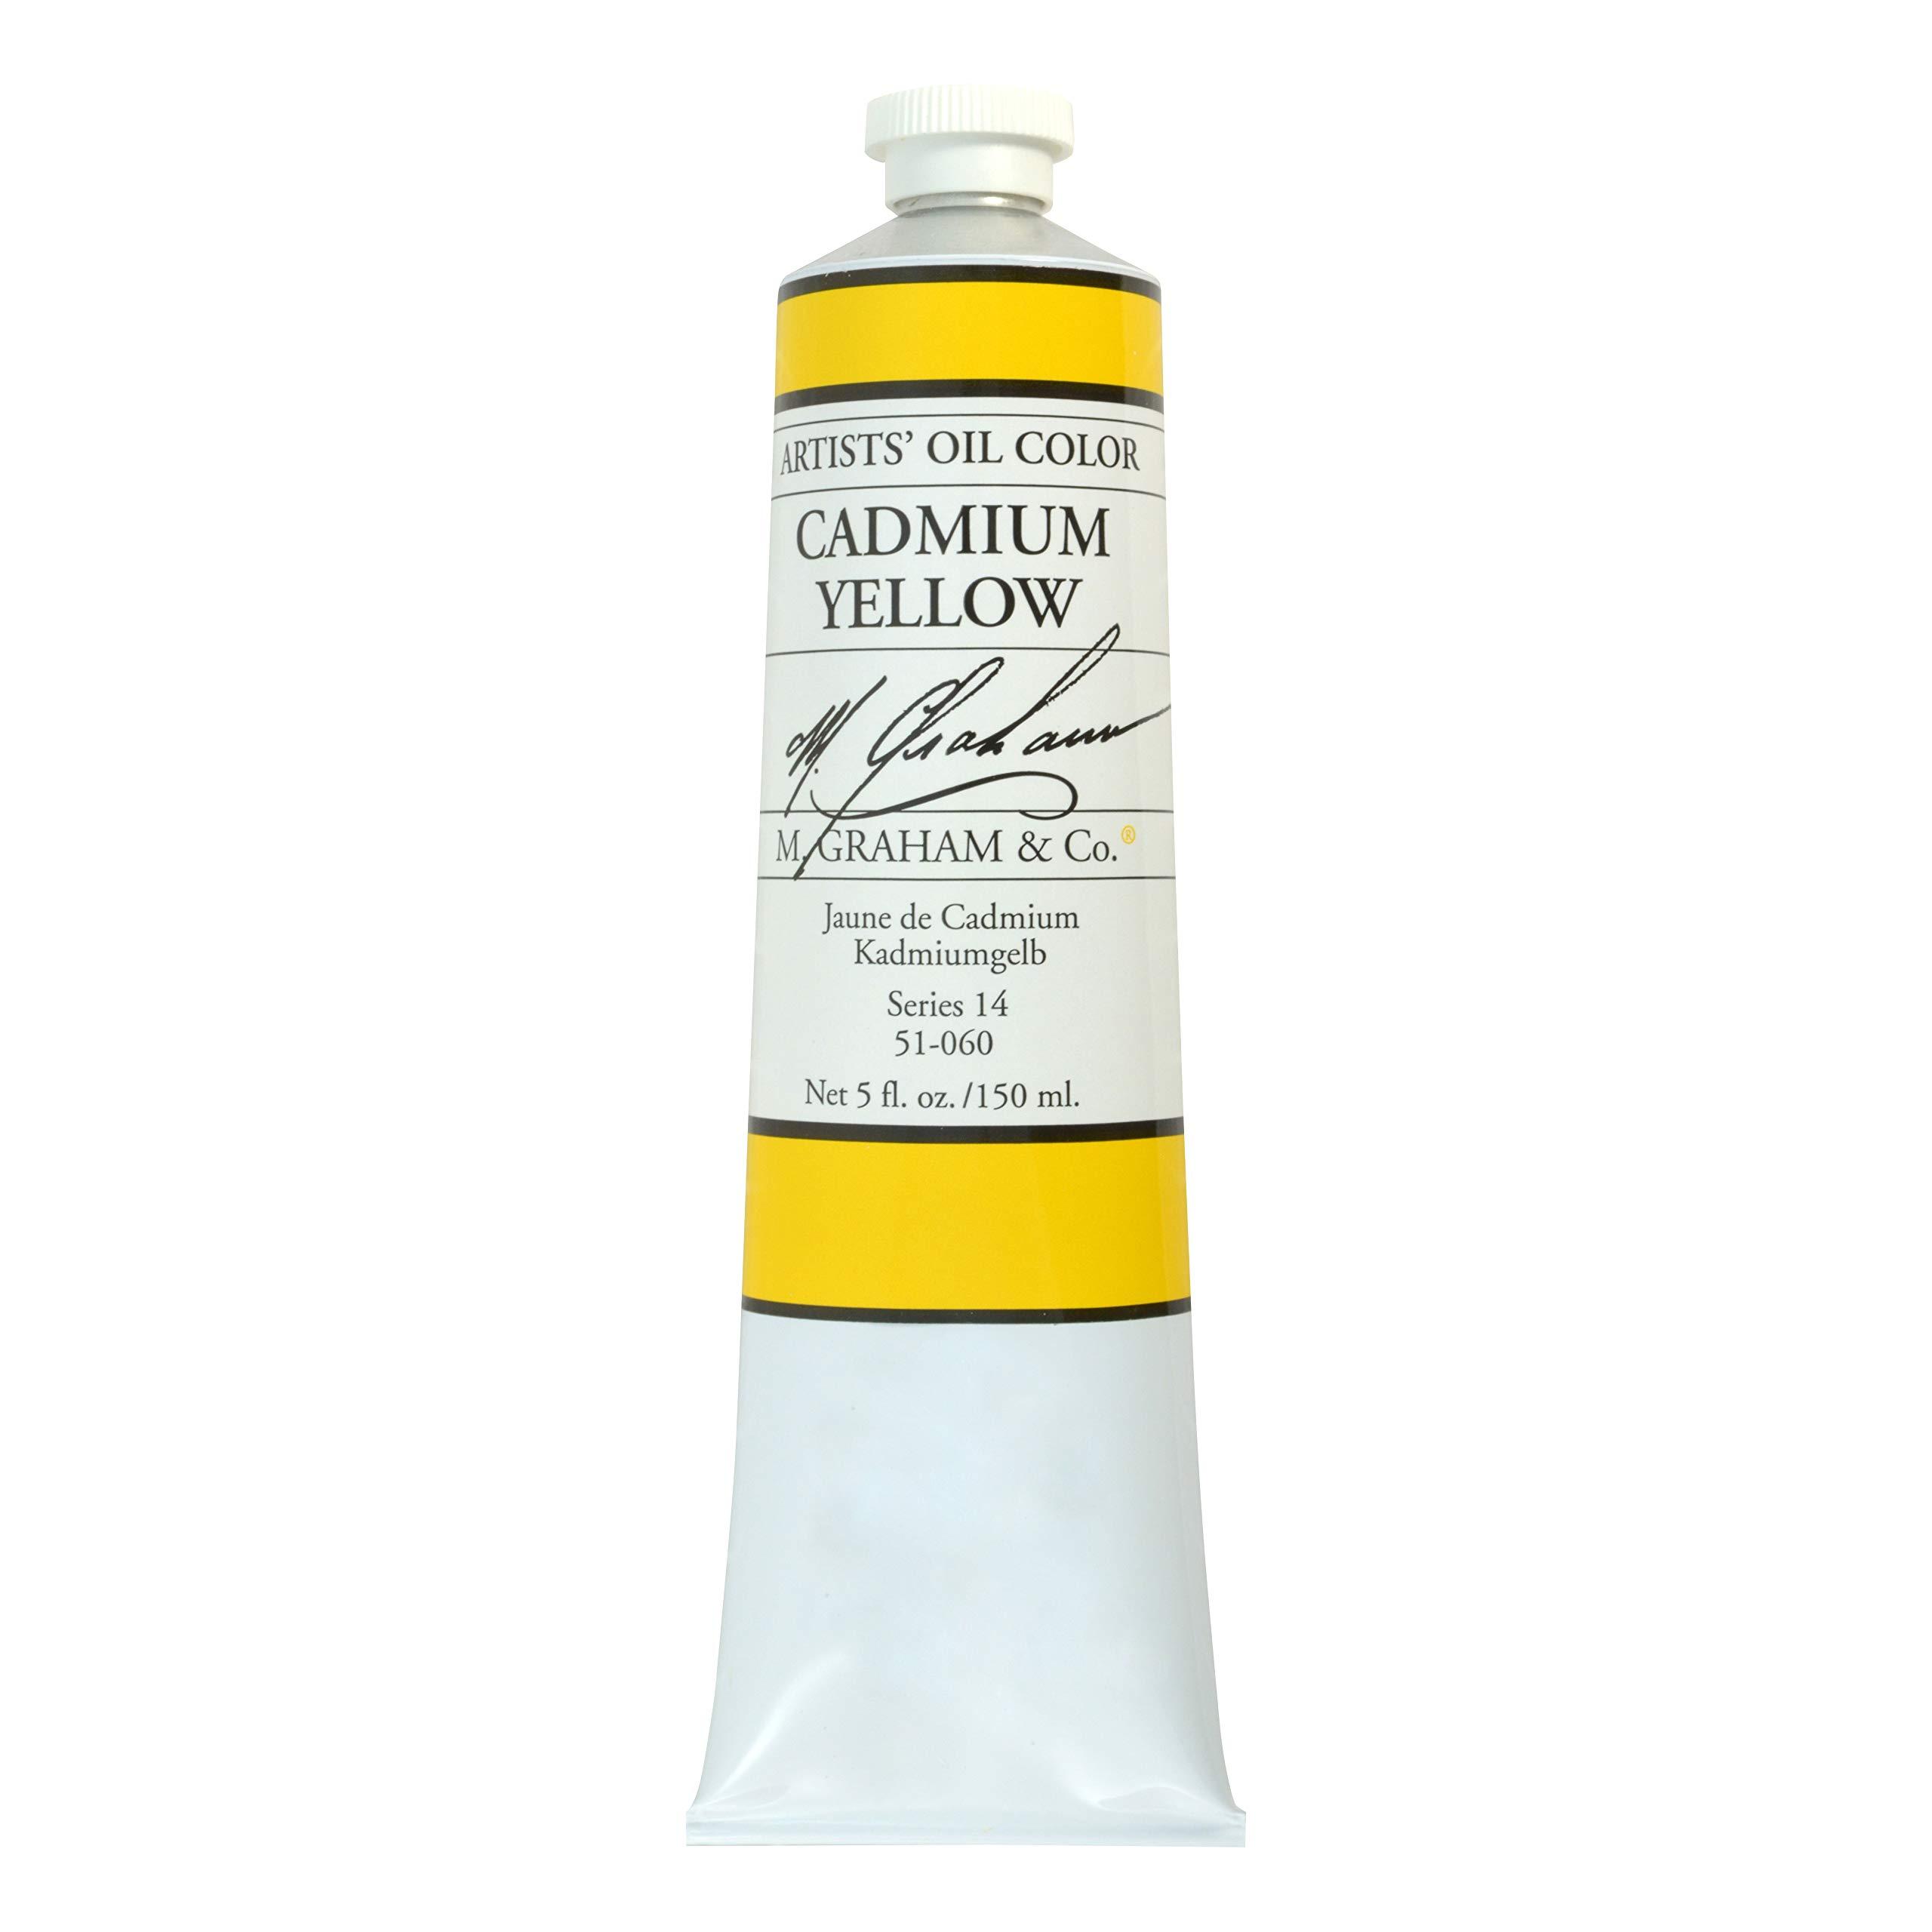 M. Graham Artist Oil Paint Cadmium Yellow 5oz Tube by M. Graham & Co.